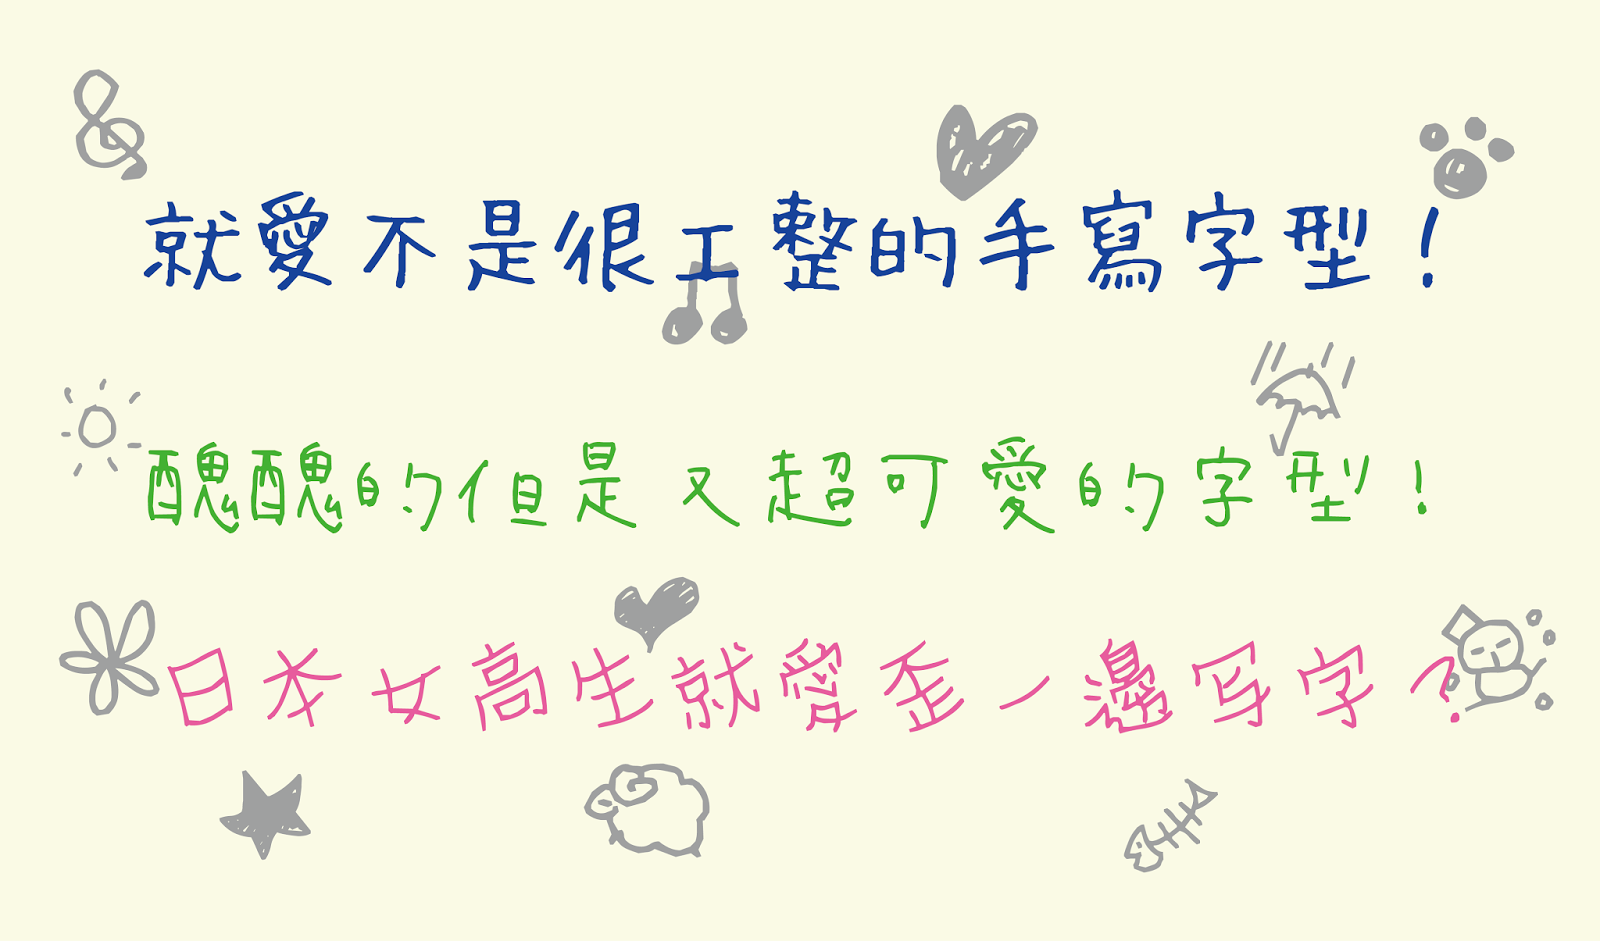 mmgtest: [字型] 就是愛不是很工整的手寫字型-三款包含大量漢字和繪文字的日文字型!